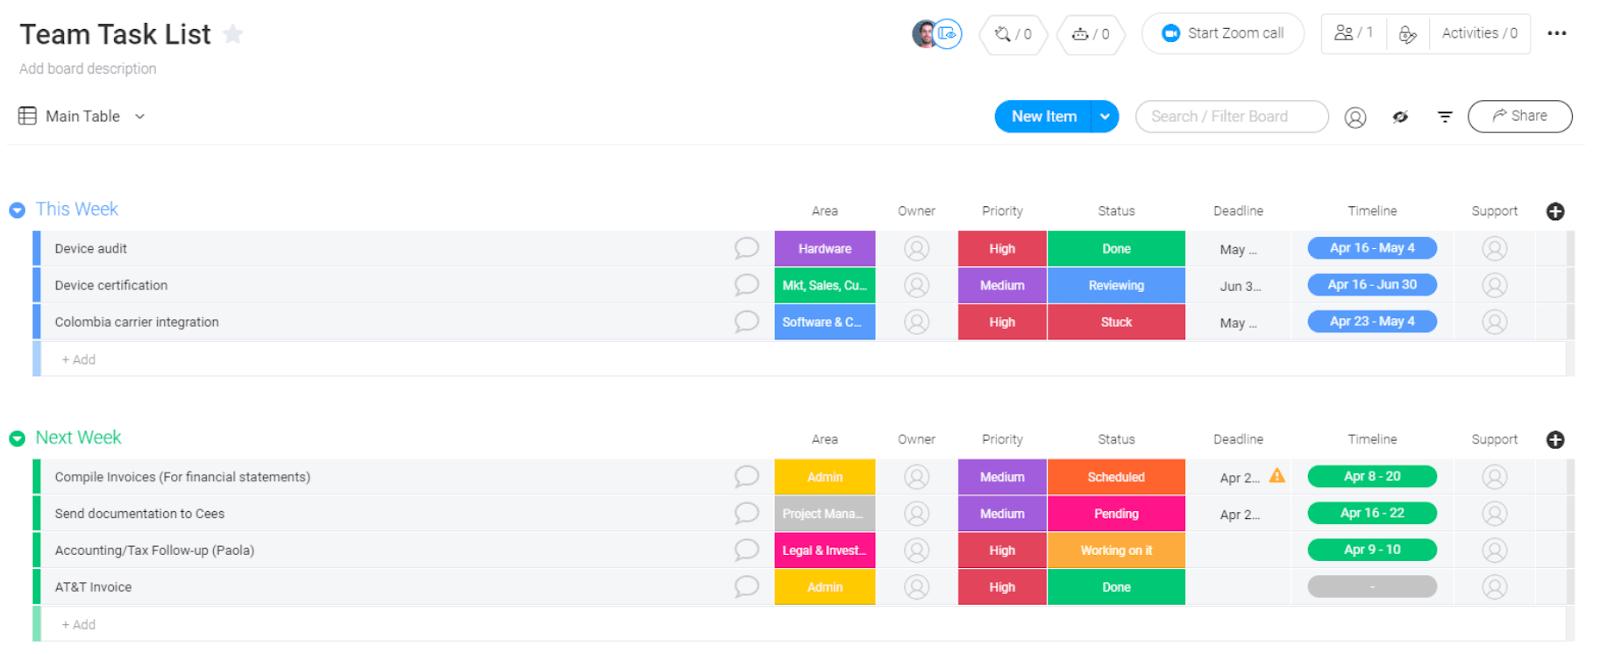 monday.com team task list